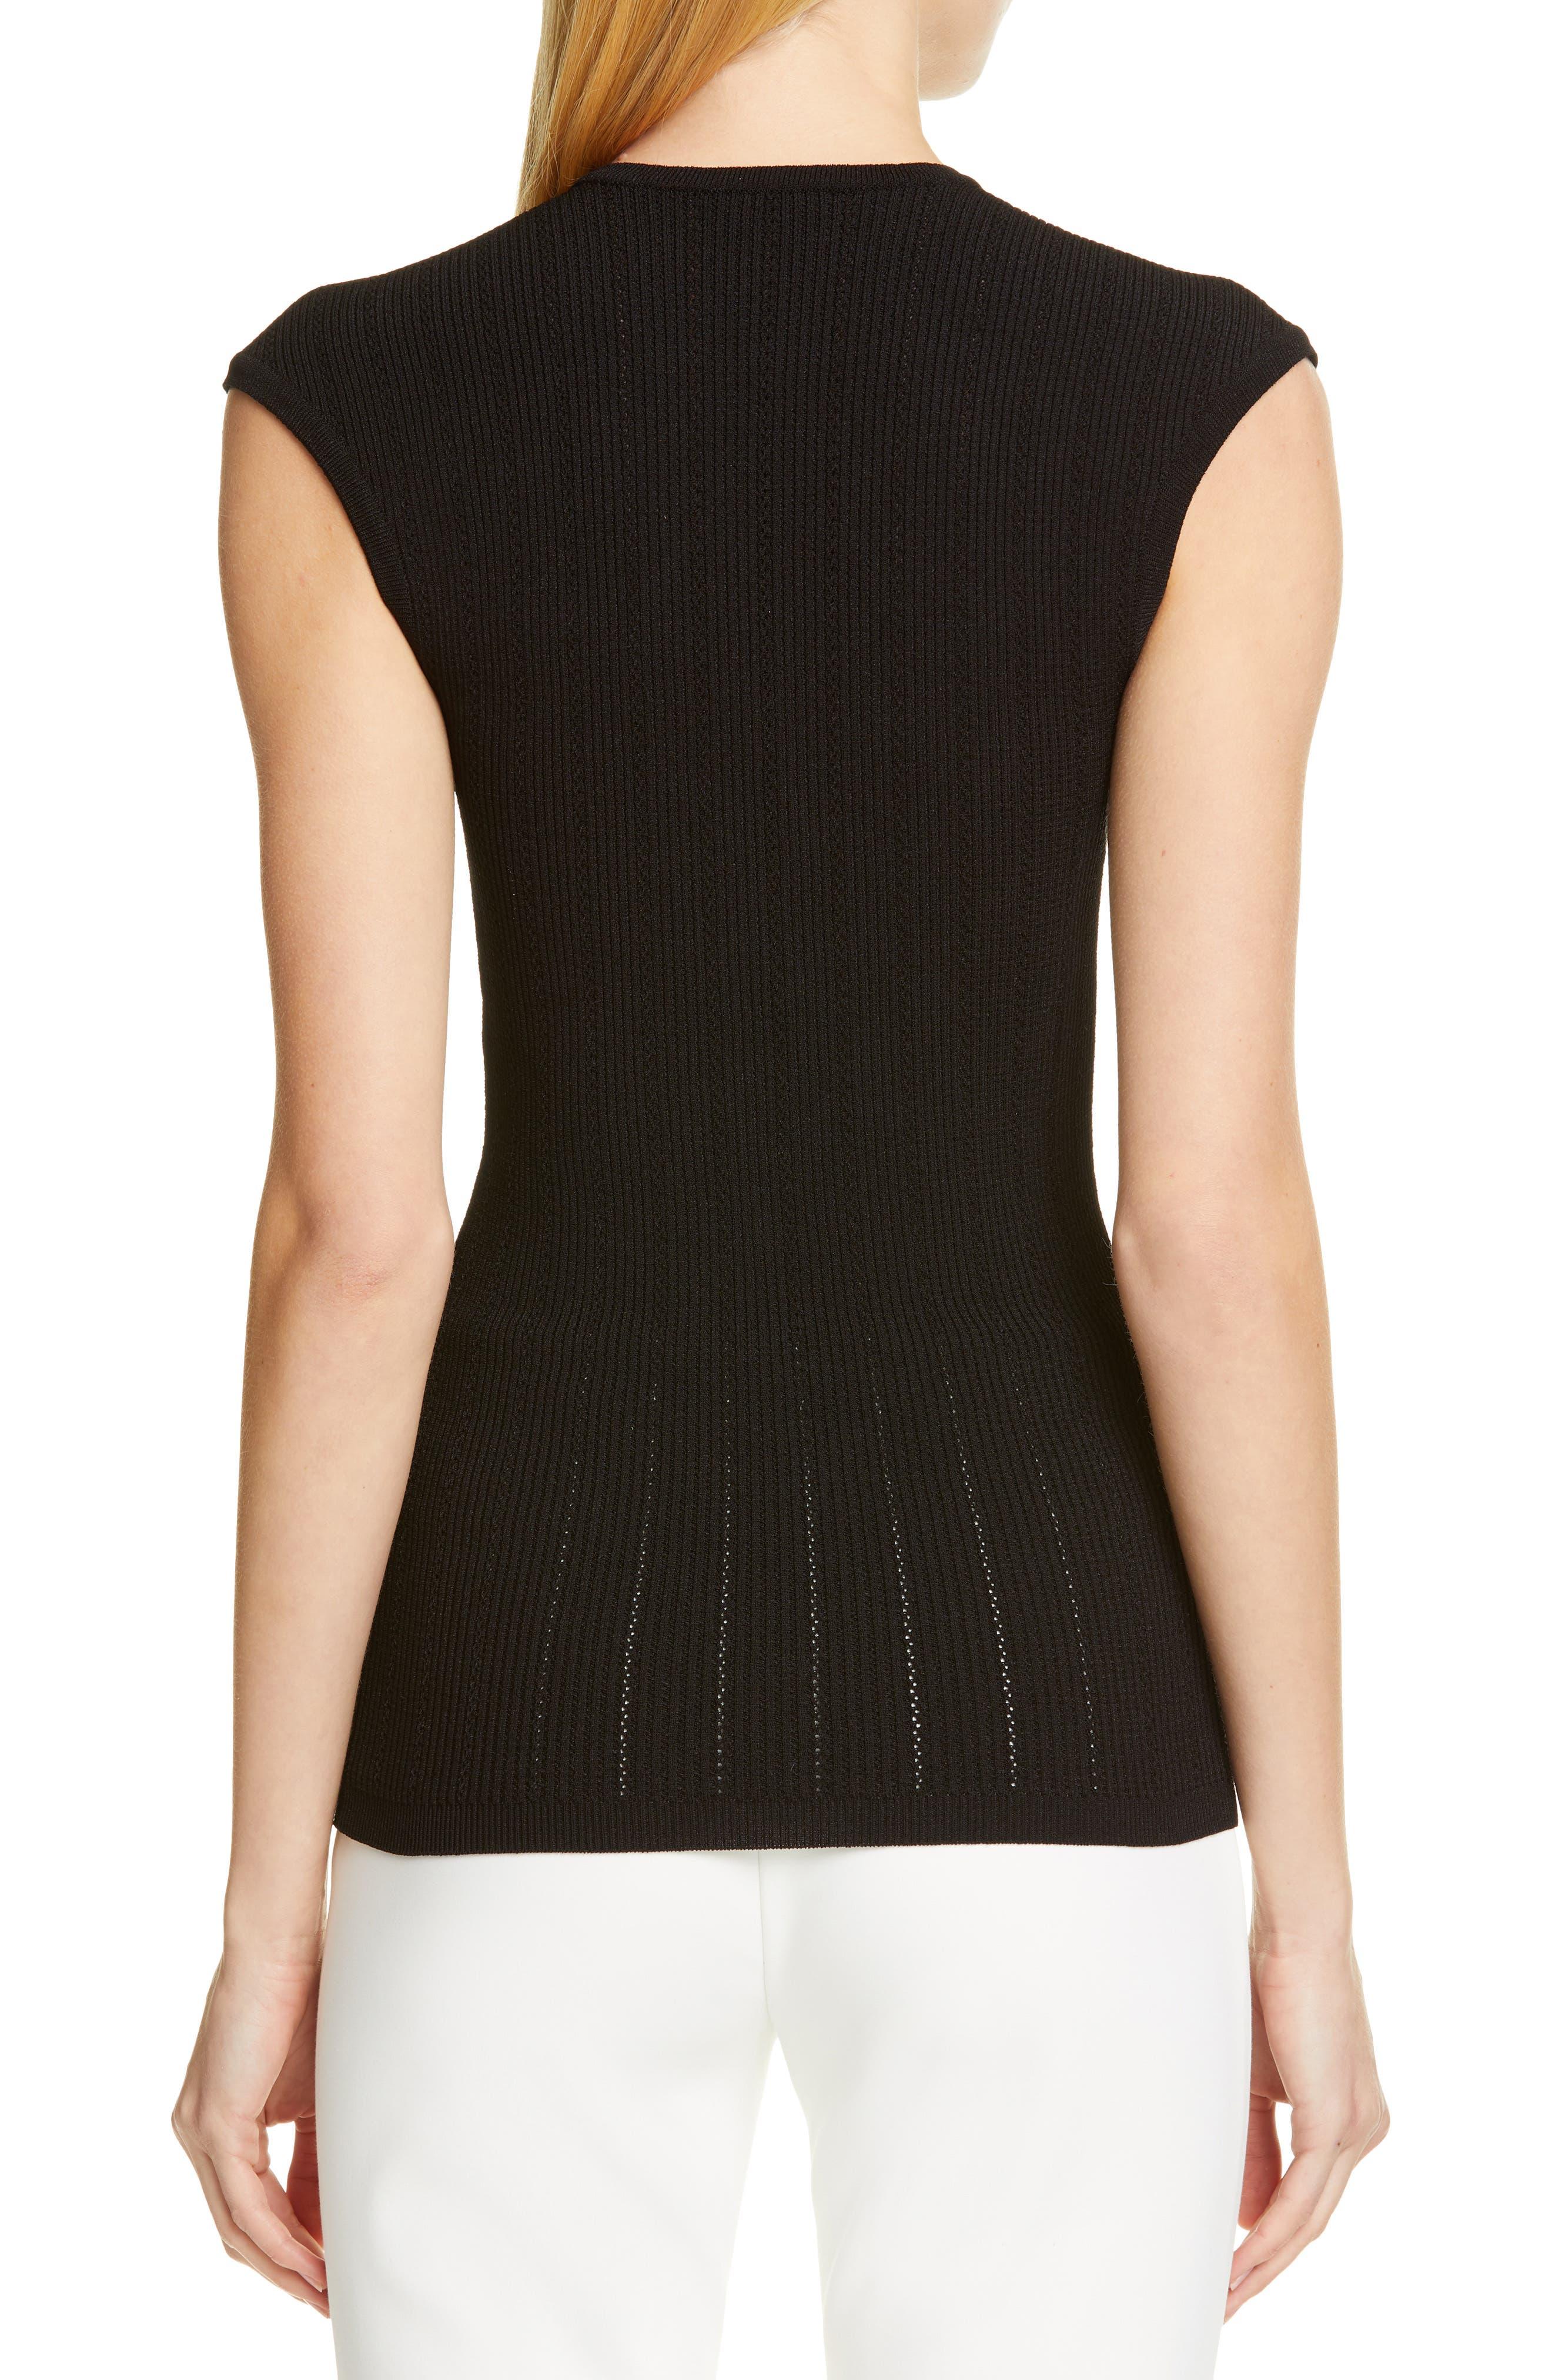 BALMAIN,                             Shoulder Button Rib Knit Top,                             Alternate thumbnail 2, color,                             0PA NOIR